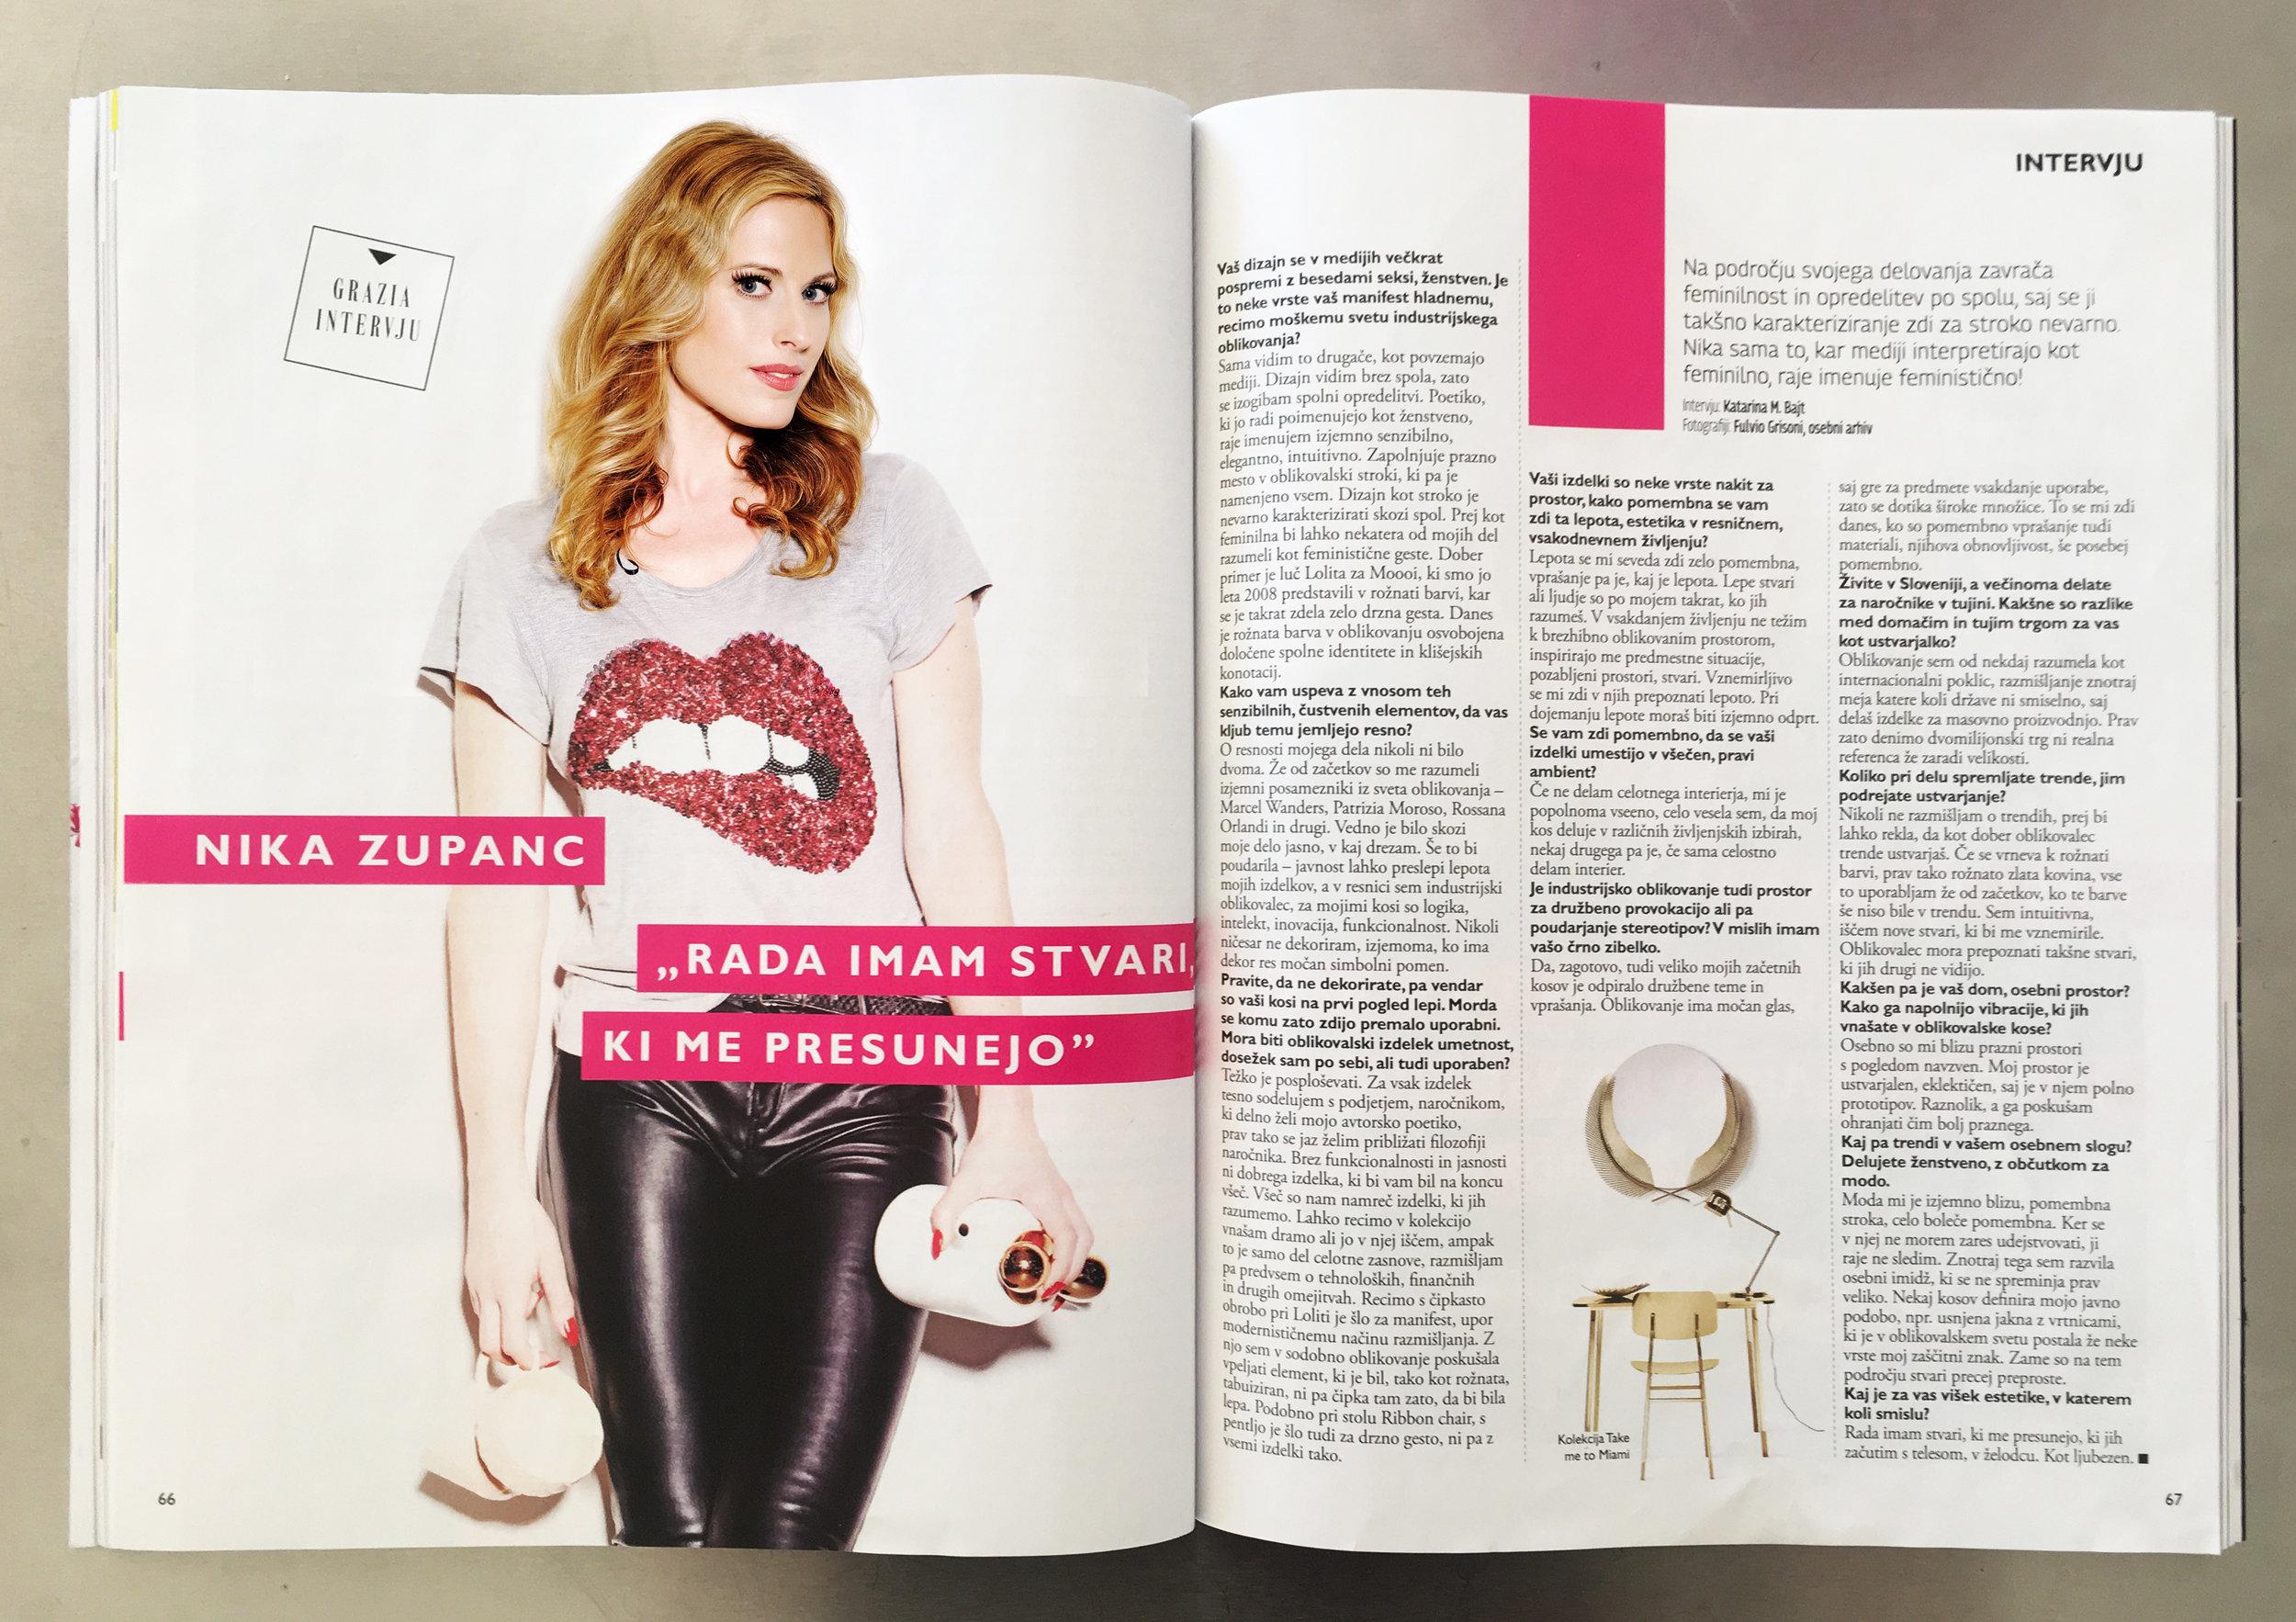 Grazia magazine, 2019